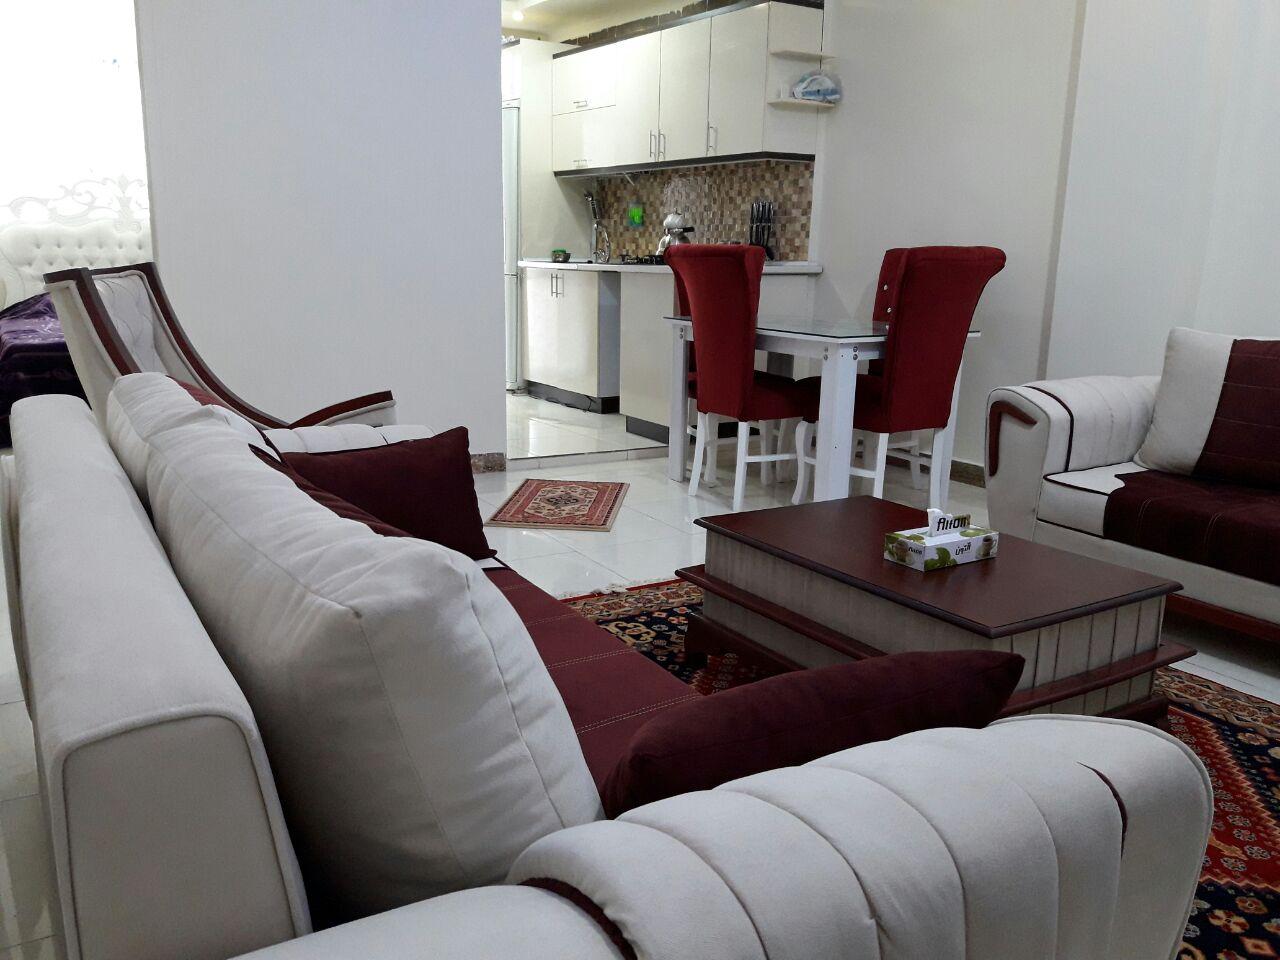 رهن آپارتمان مبله در اصفهان YG1438